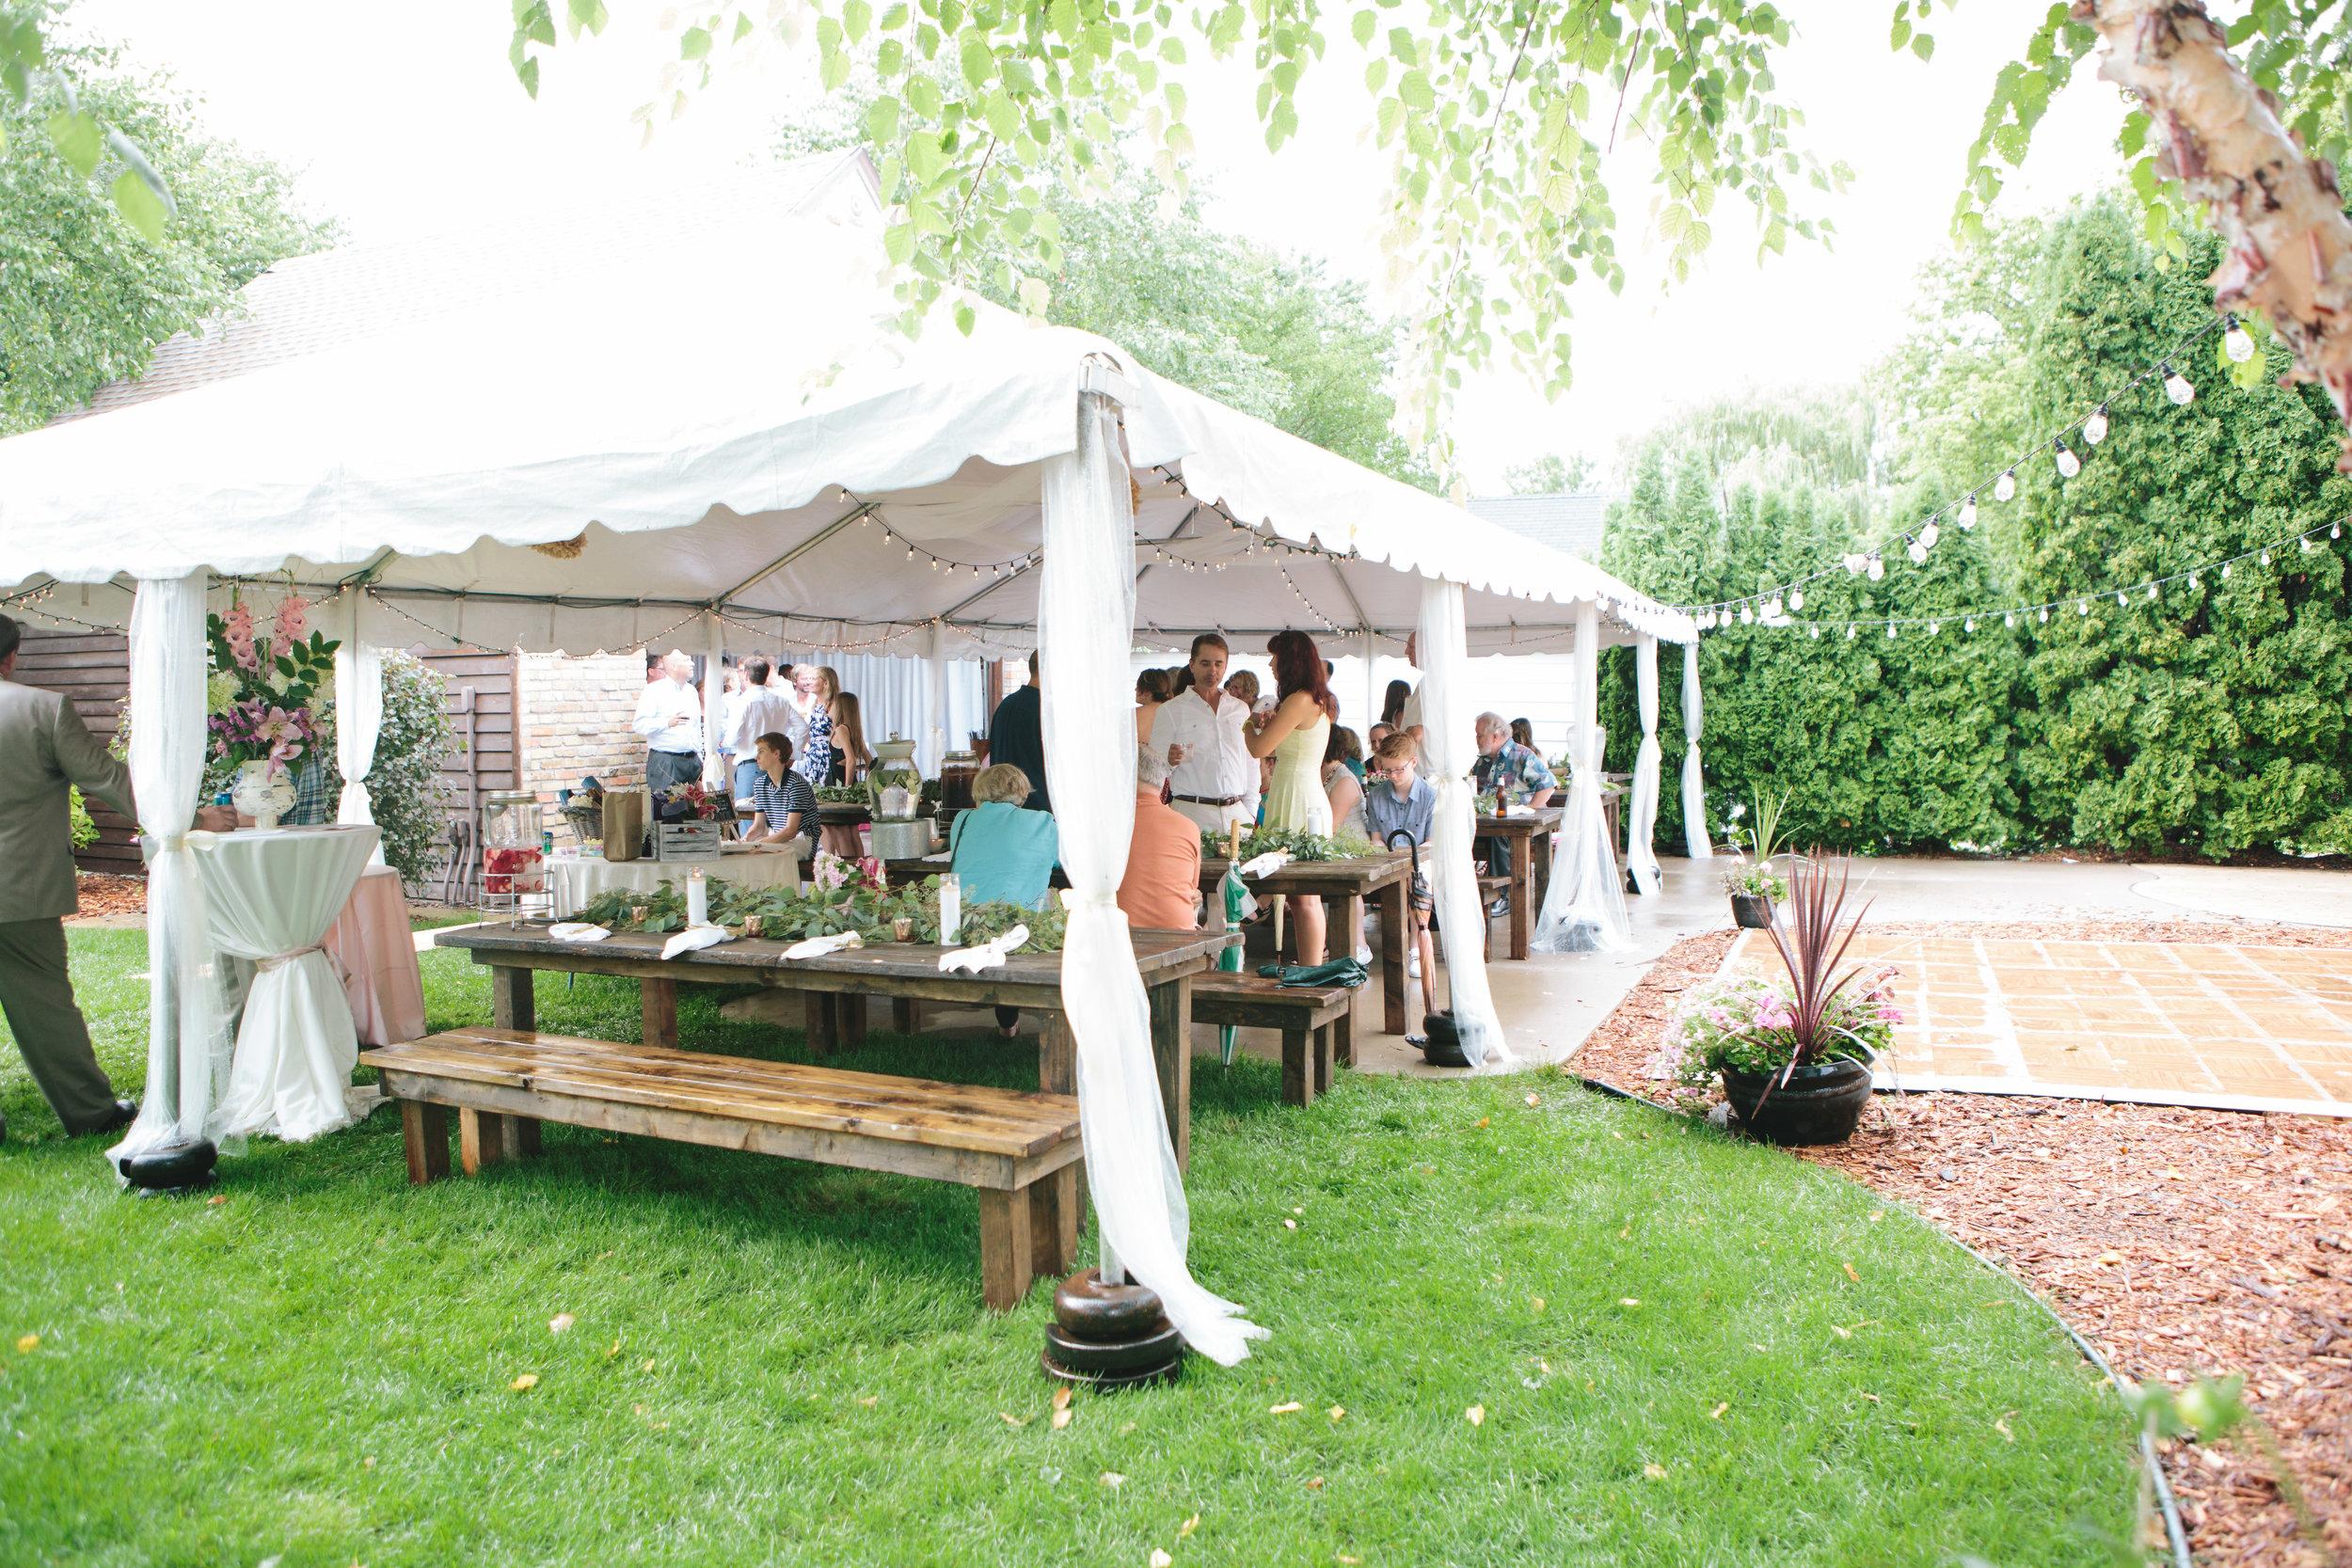 tented wedding reception, prepare for rain on wedding day, wedding string lights, backyard wedding reception inspiration